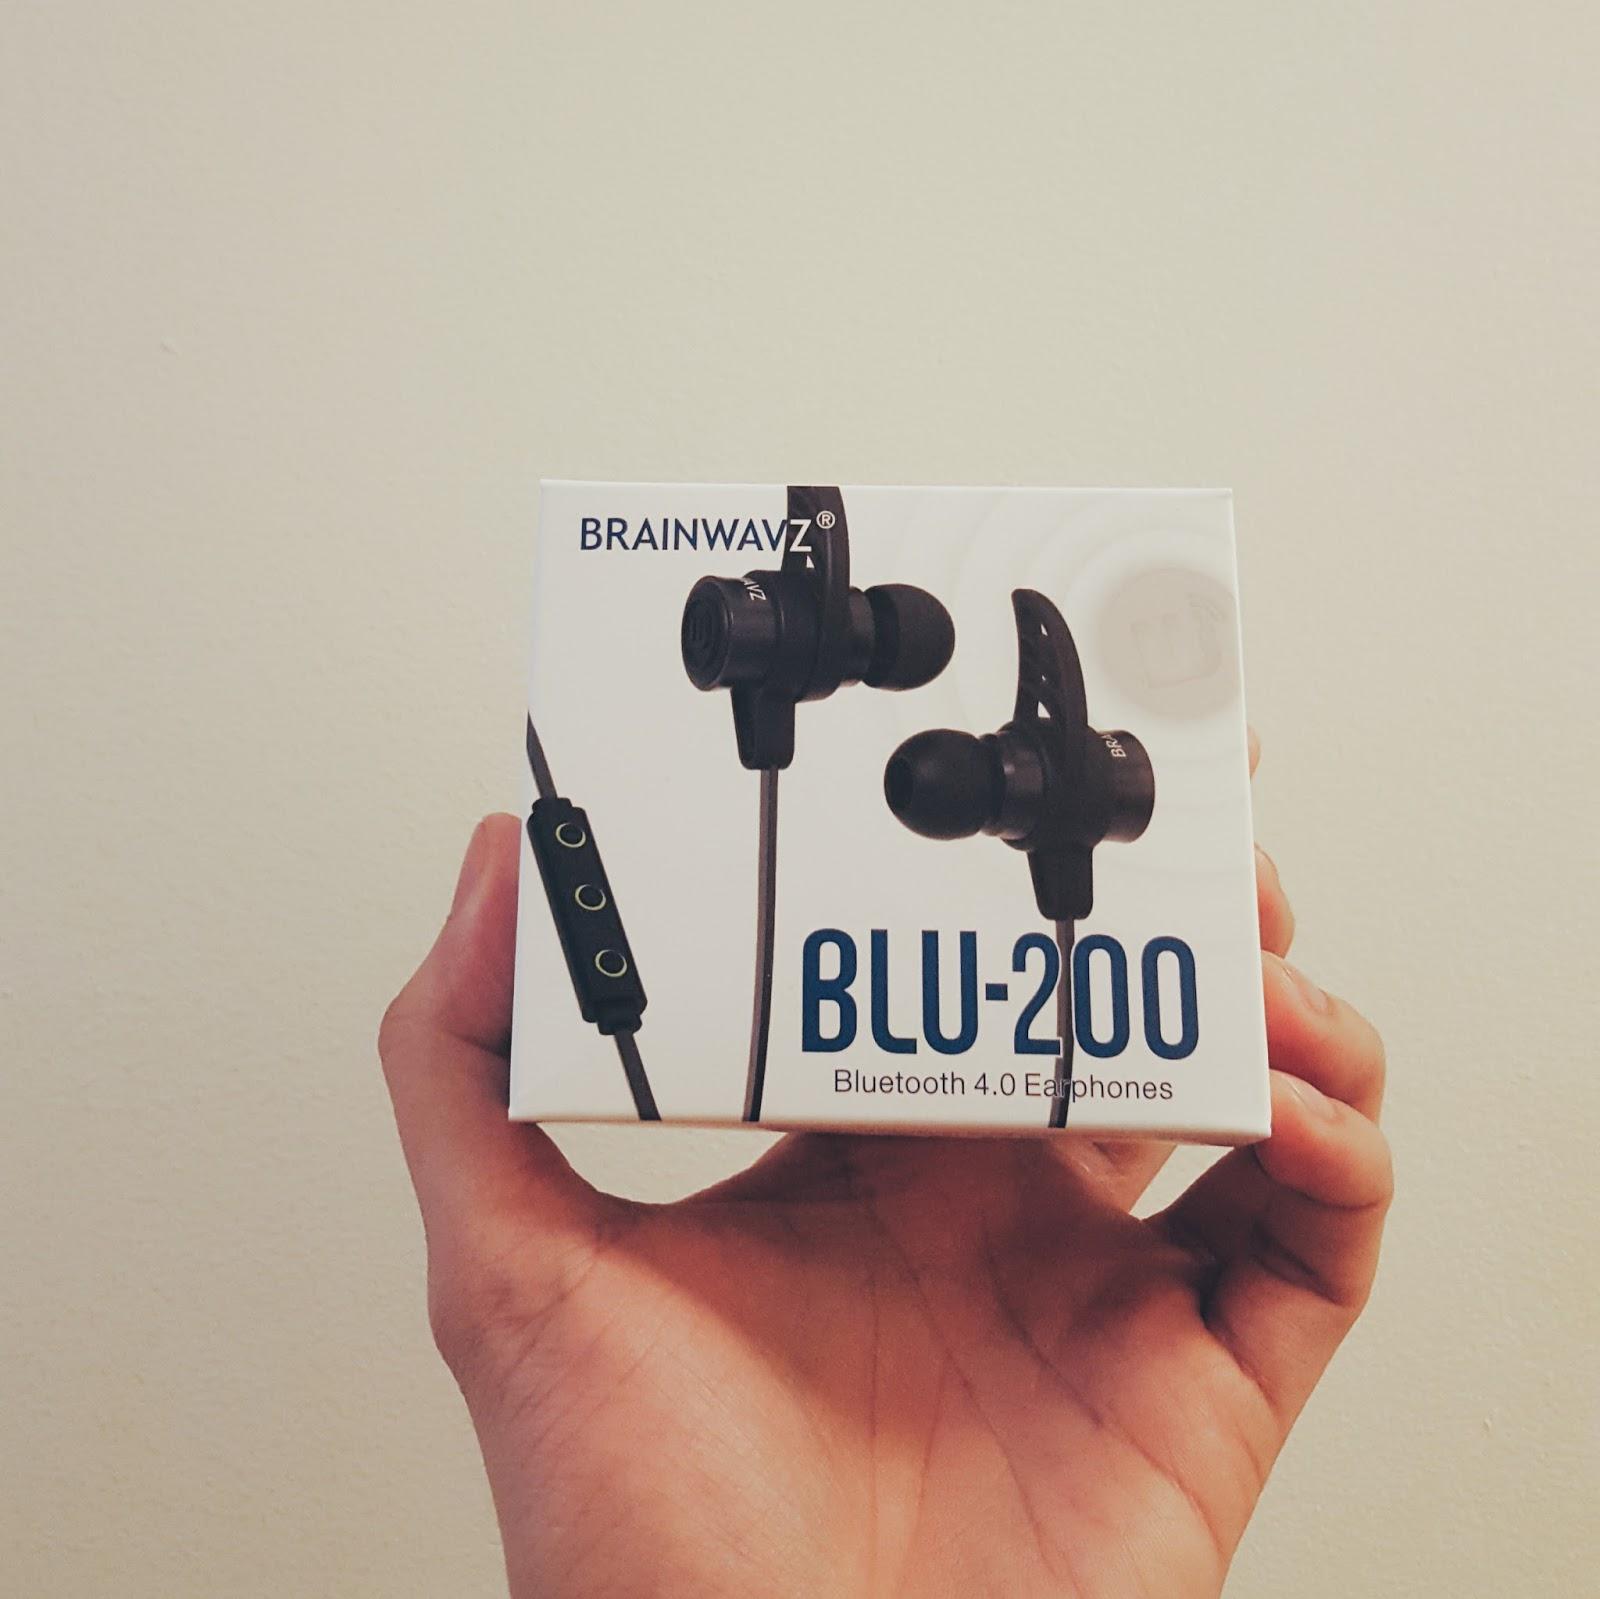 Product Review: Brainwavz Bluetooth Earphones